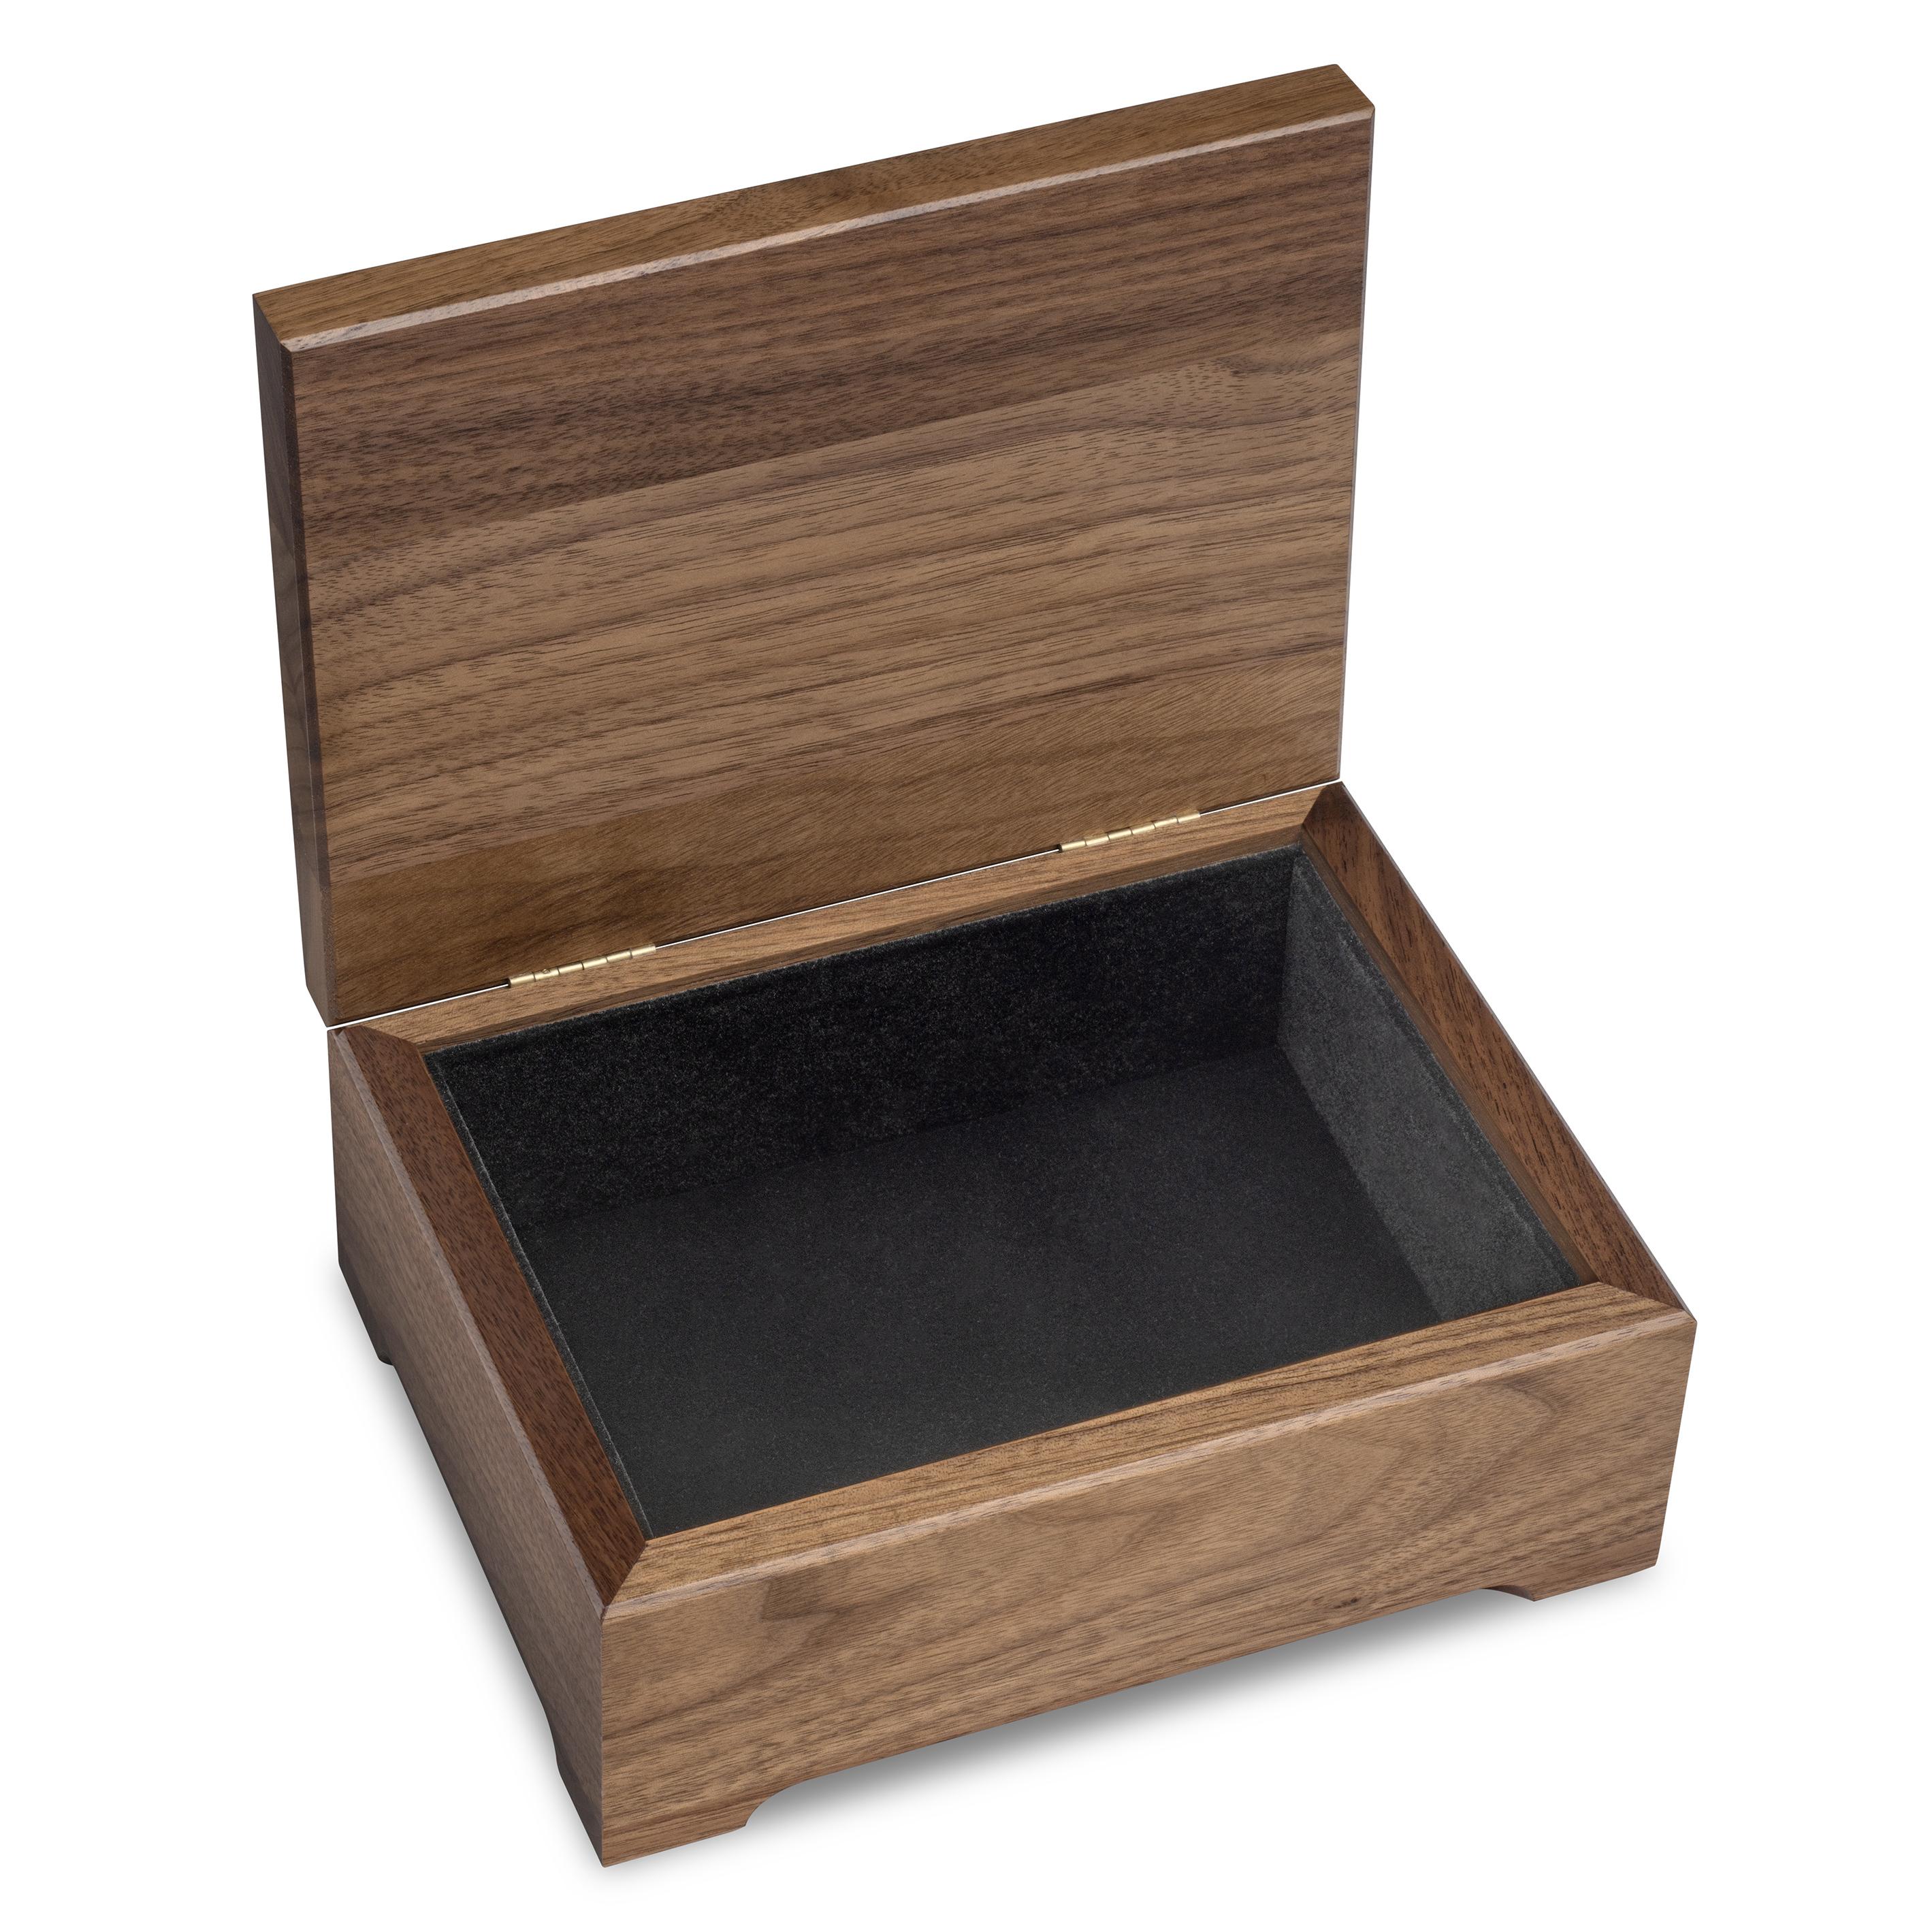 Clemson Solid Walnut Desk Box - Image 2